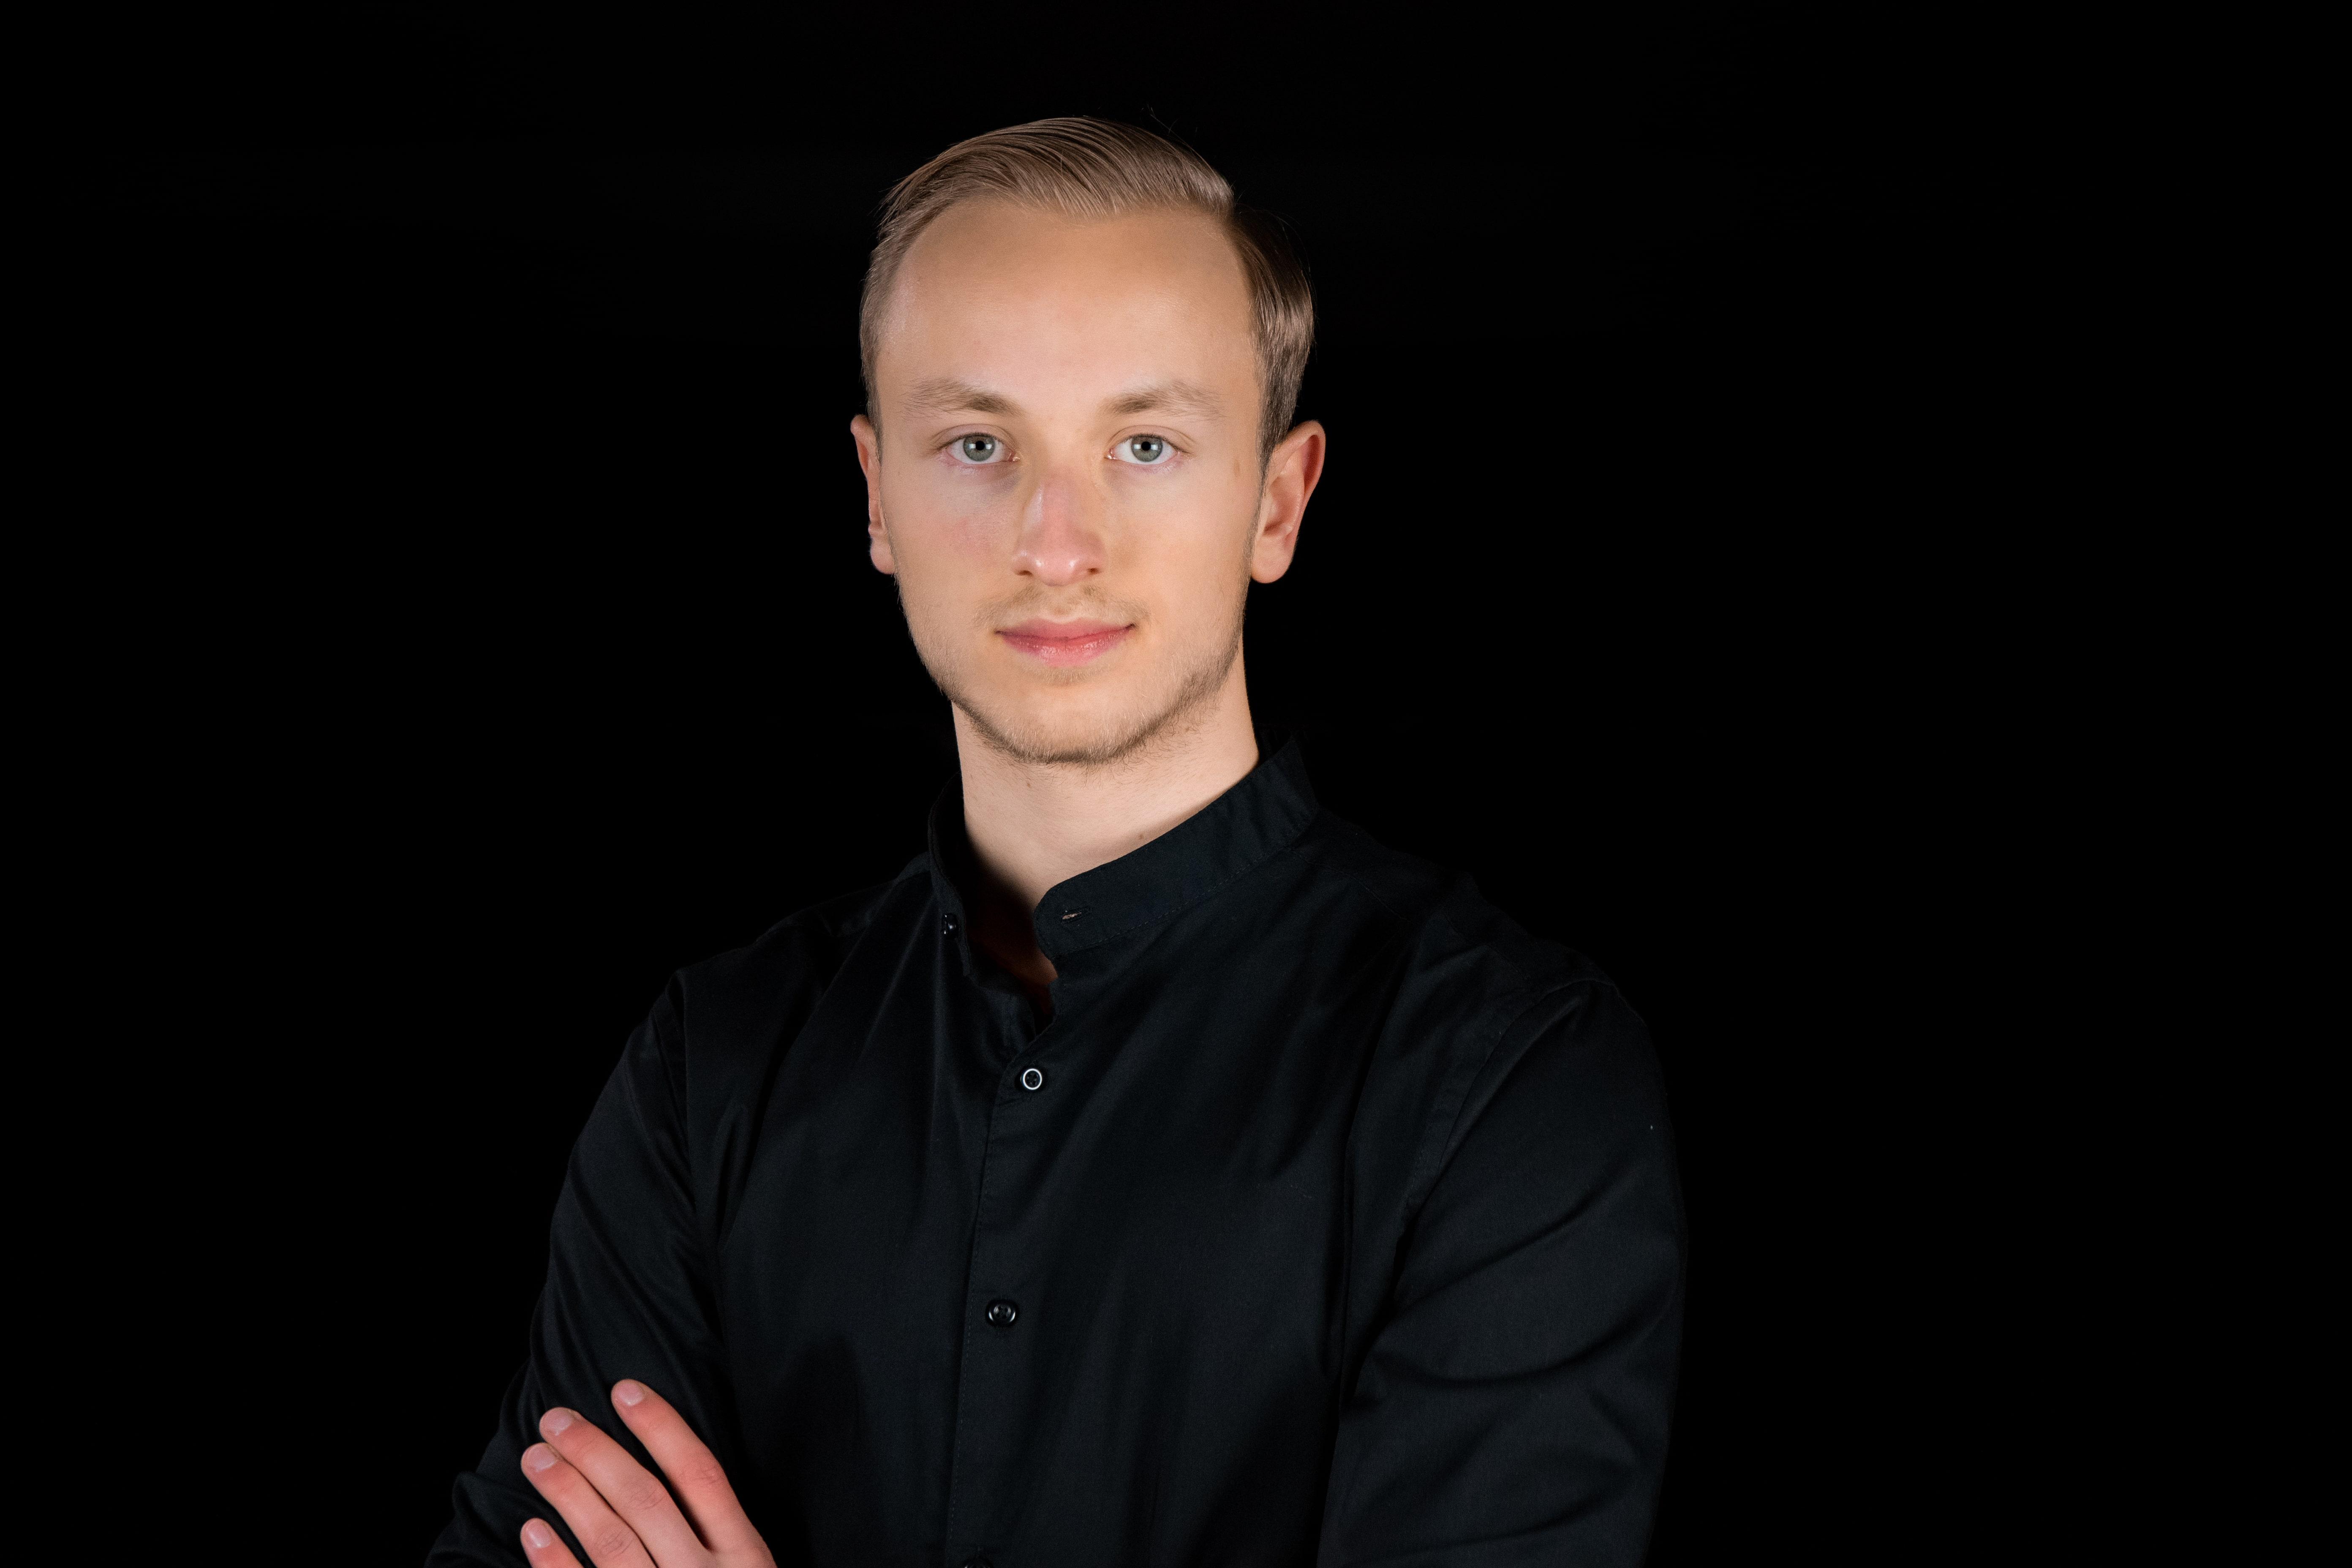 Kristian Krijgsman